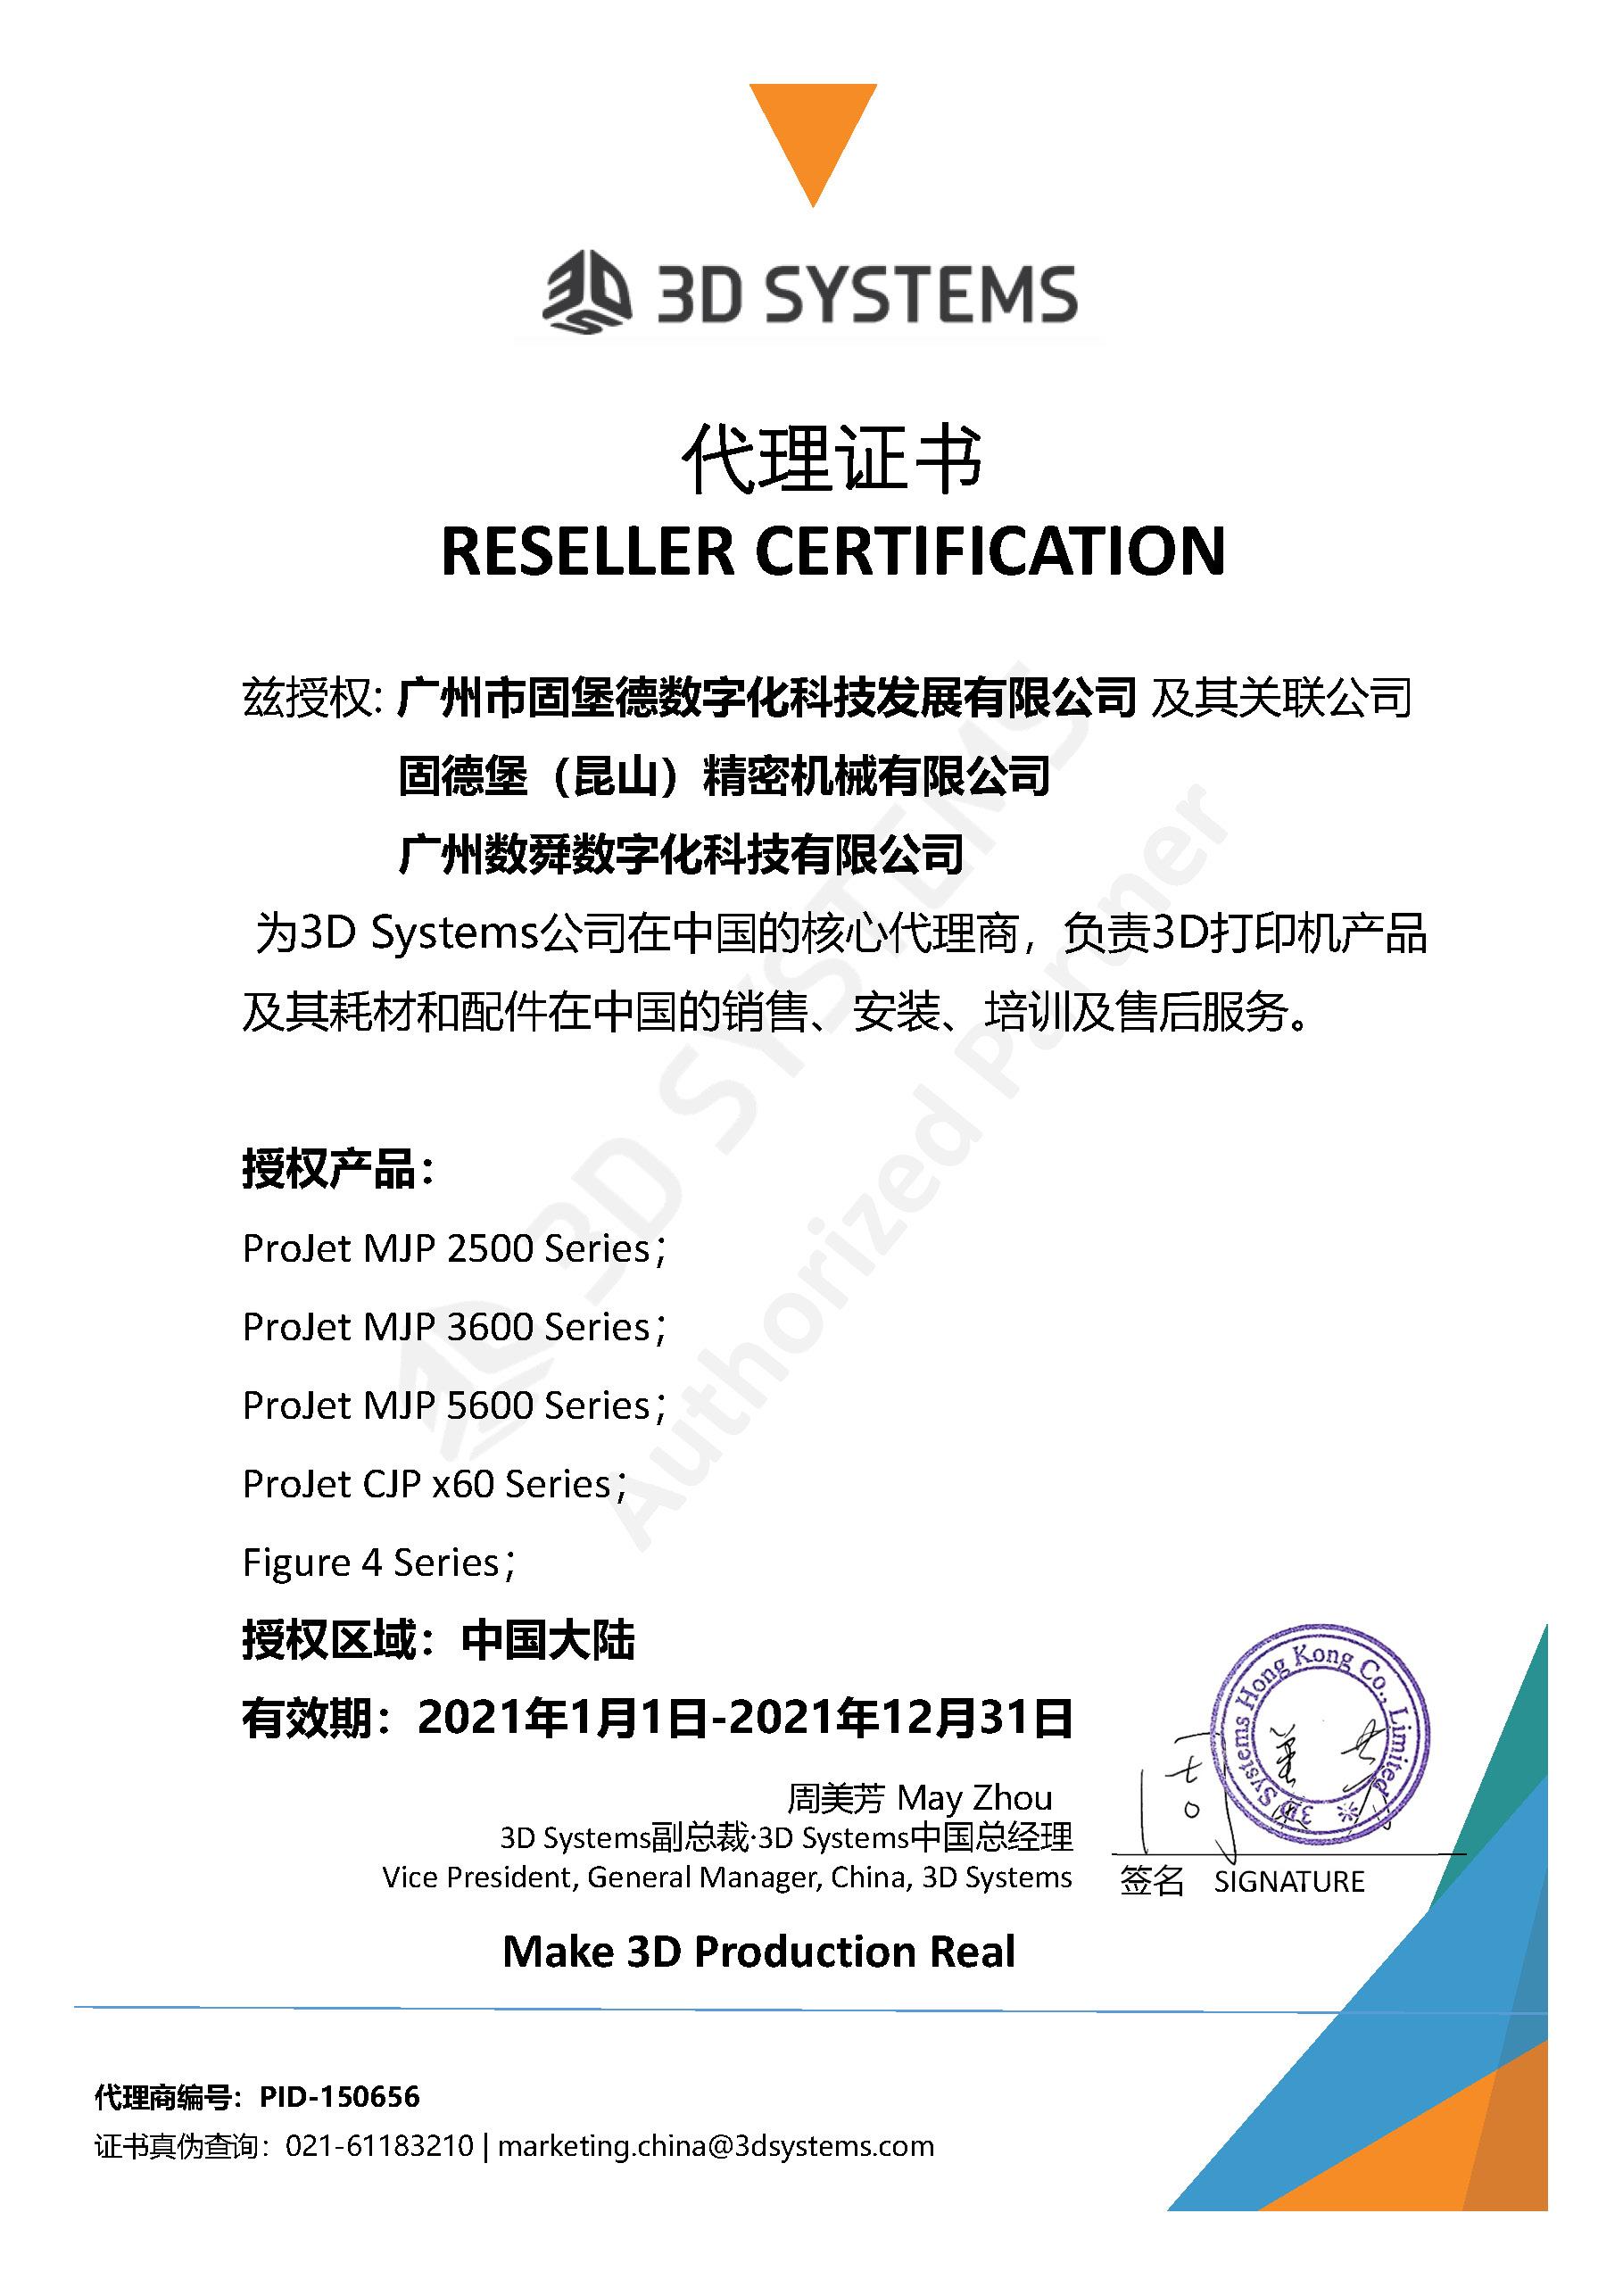 <span>2021年版-MR授权证书</span><br />